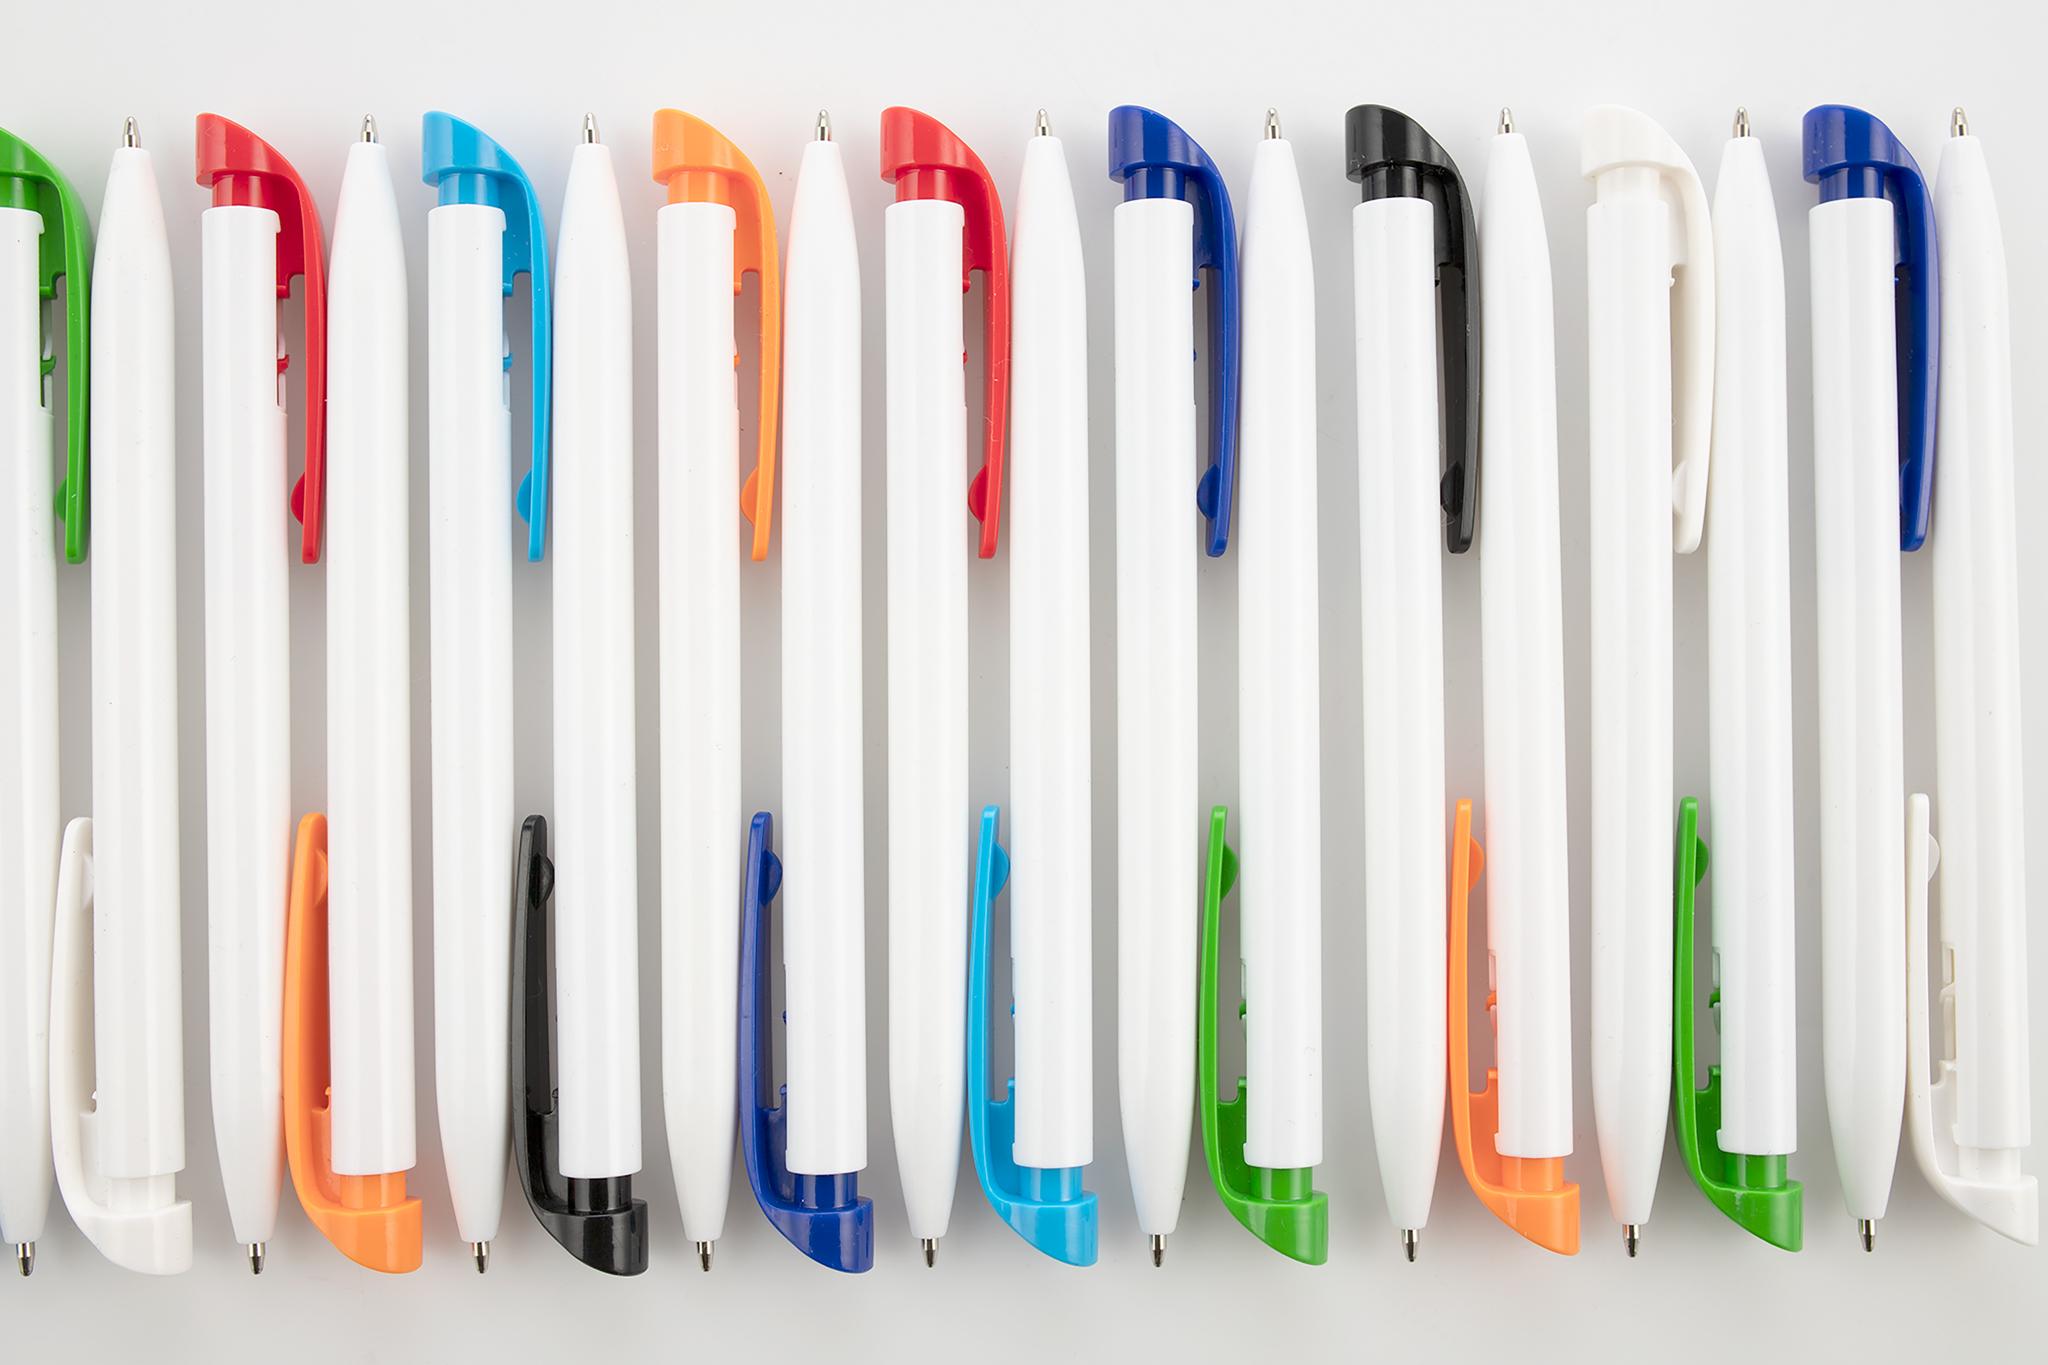 SDI02 Plastic Pen